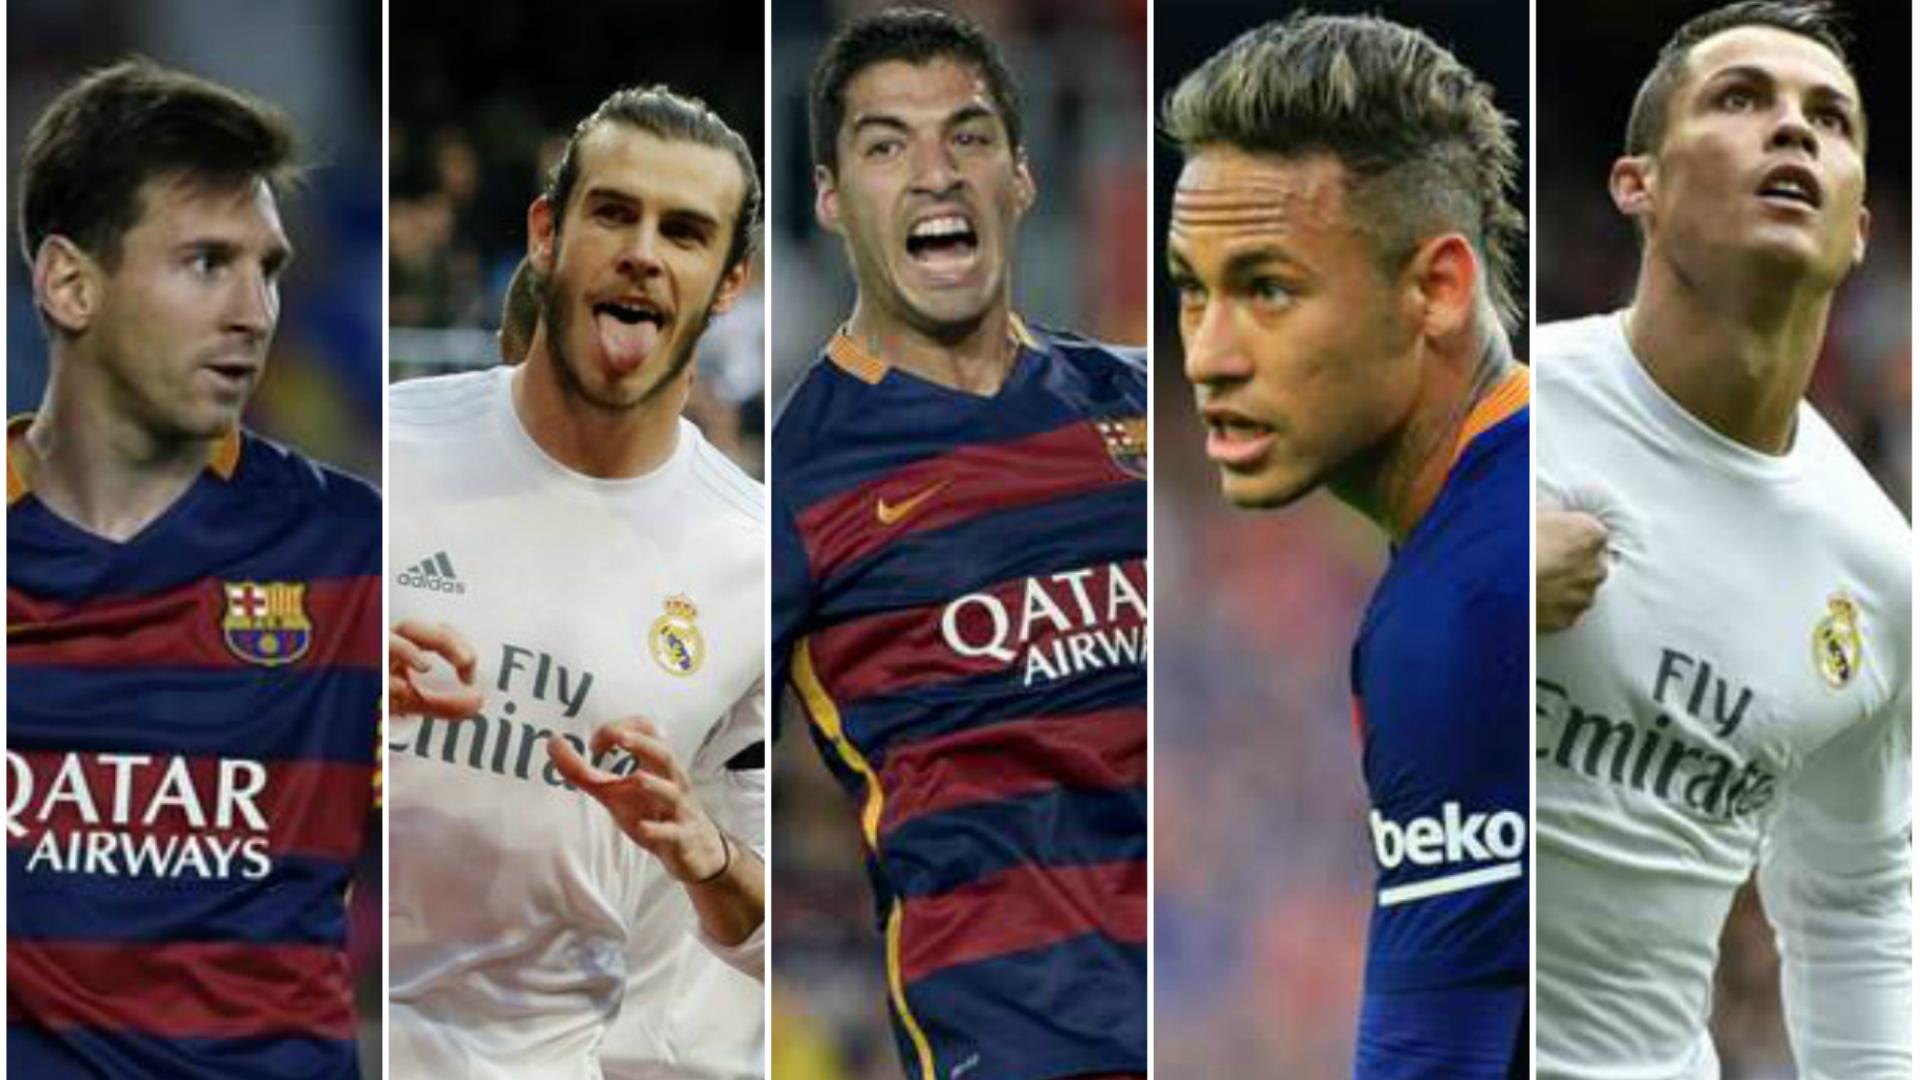 Messi Bale Neymar Suarez Cristiano Ronaldo - Goal.com | 1920 x 1080 jpeg 953kB